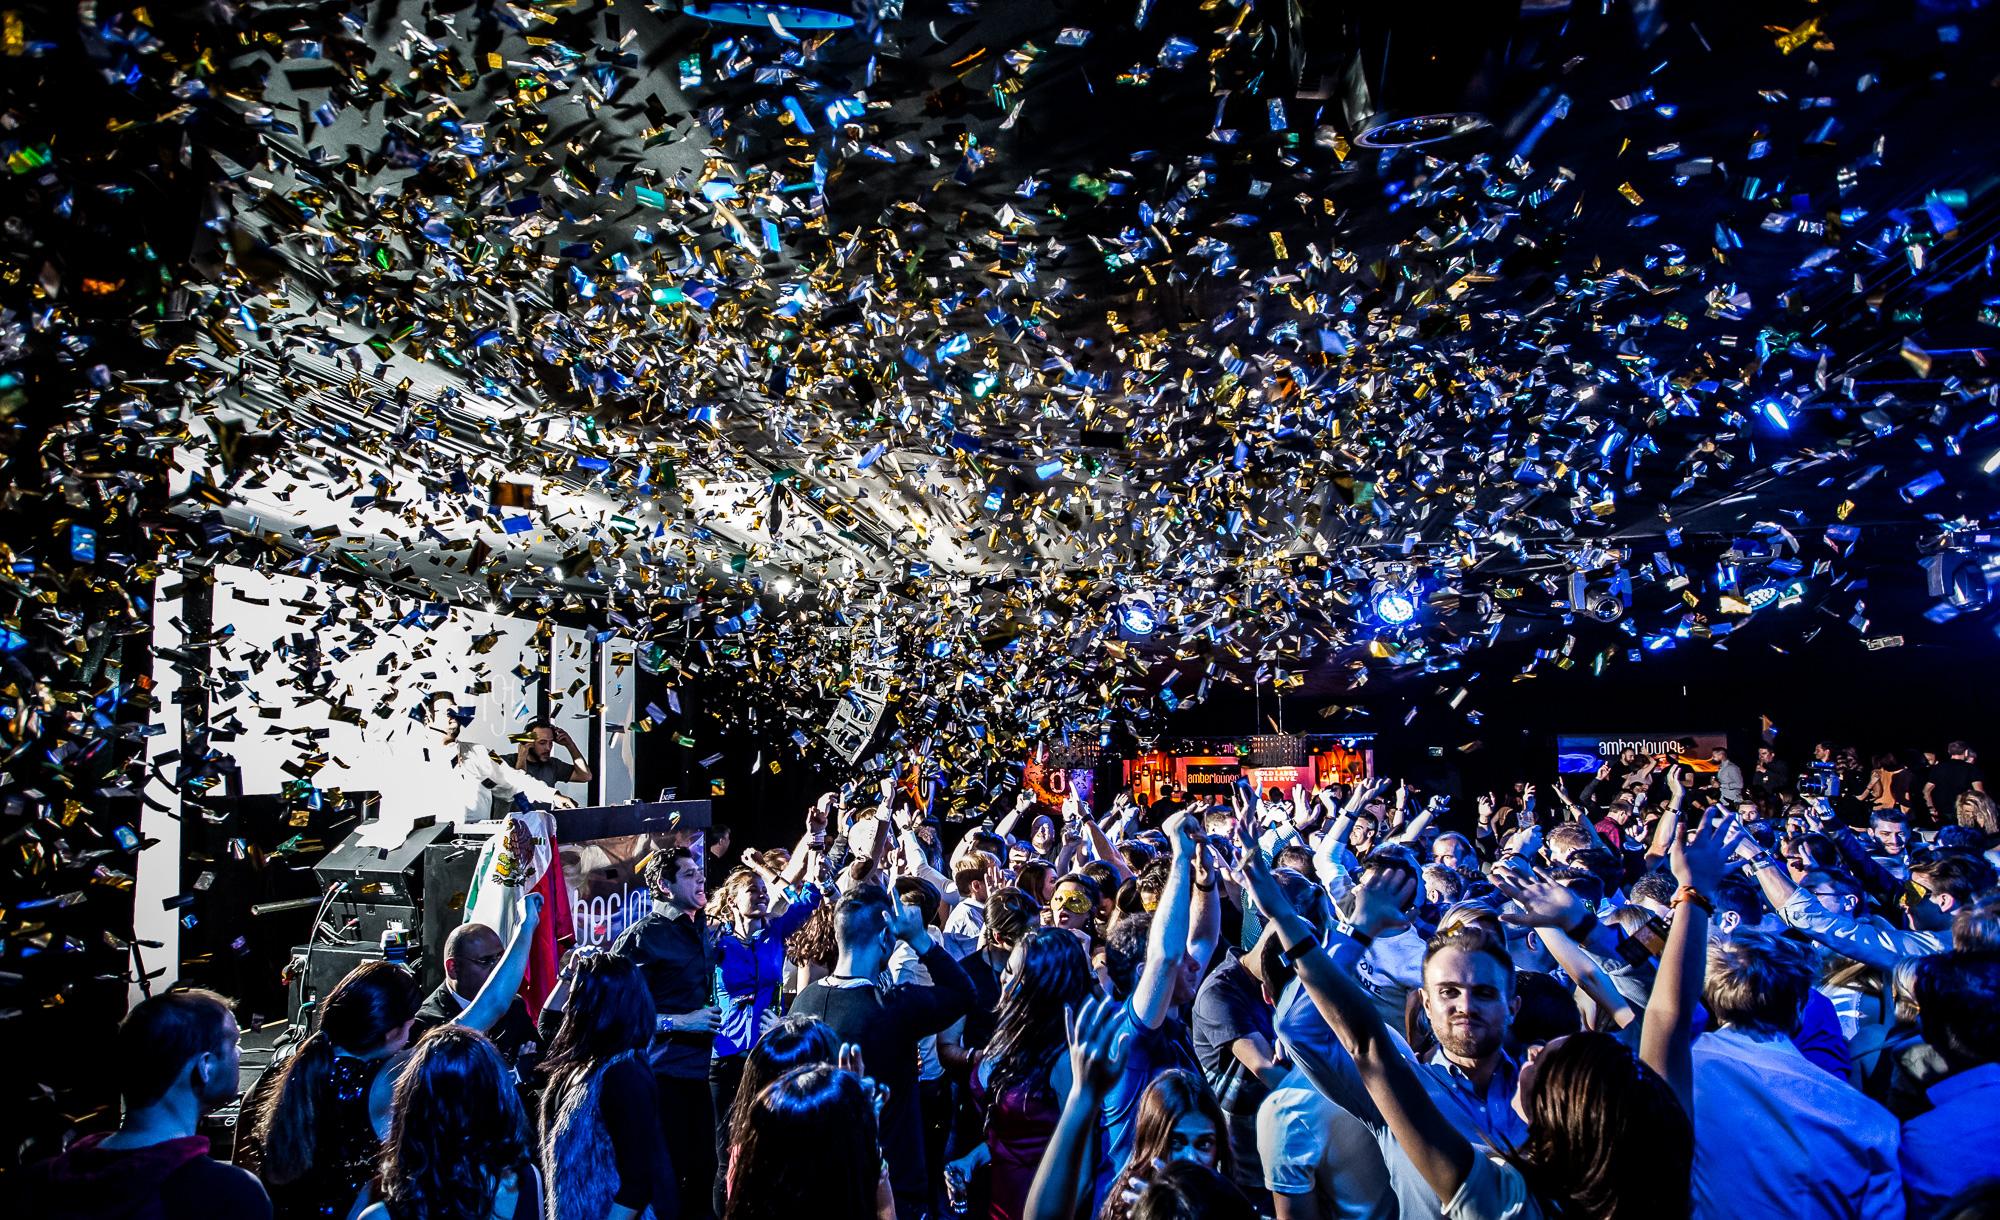 La gran fiesta de Amber Lounge regresa a la CDMX este año